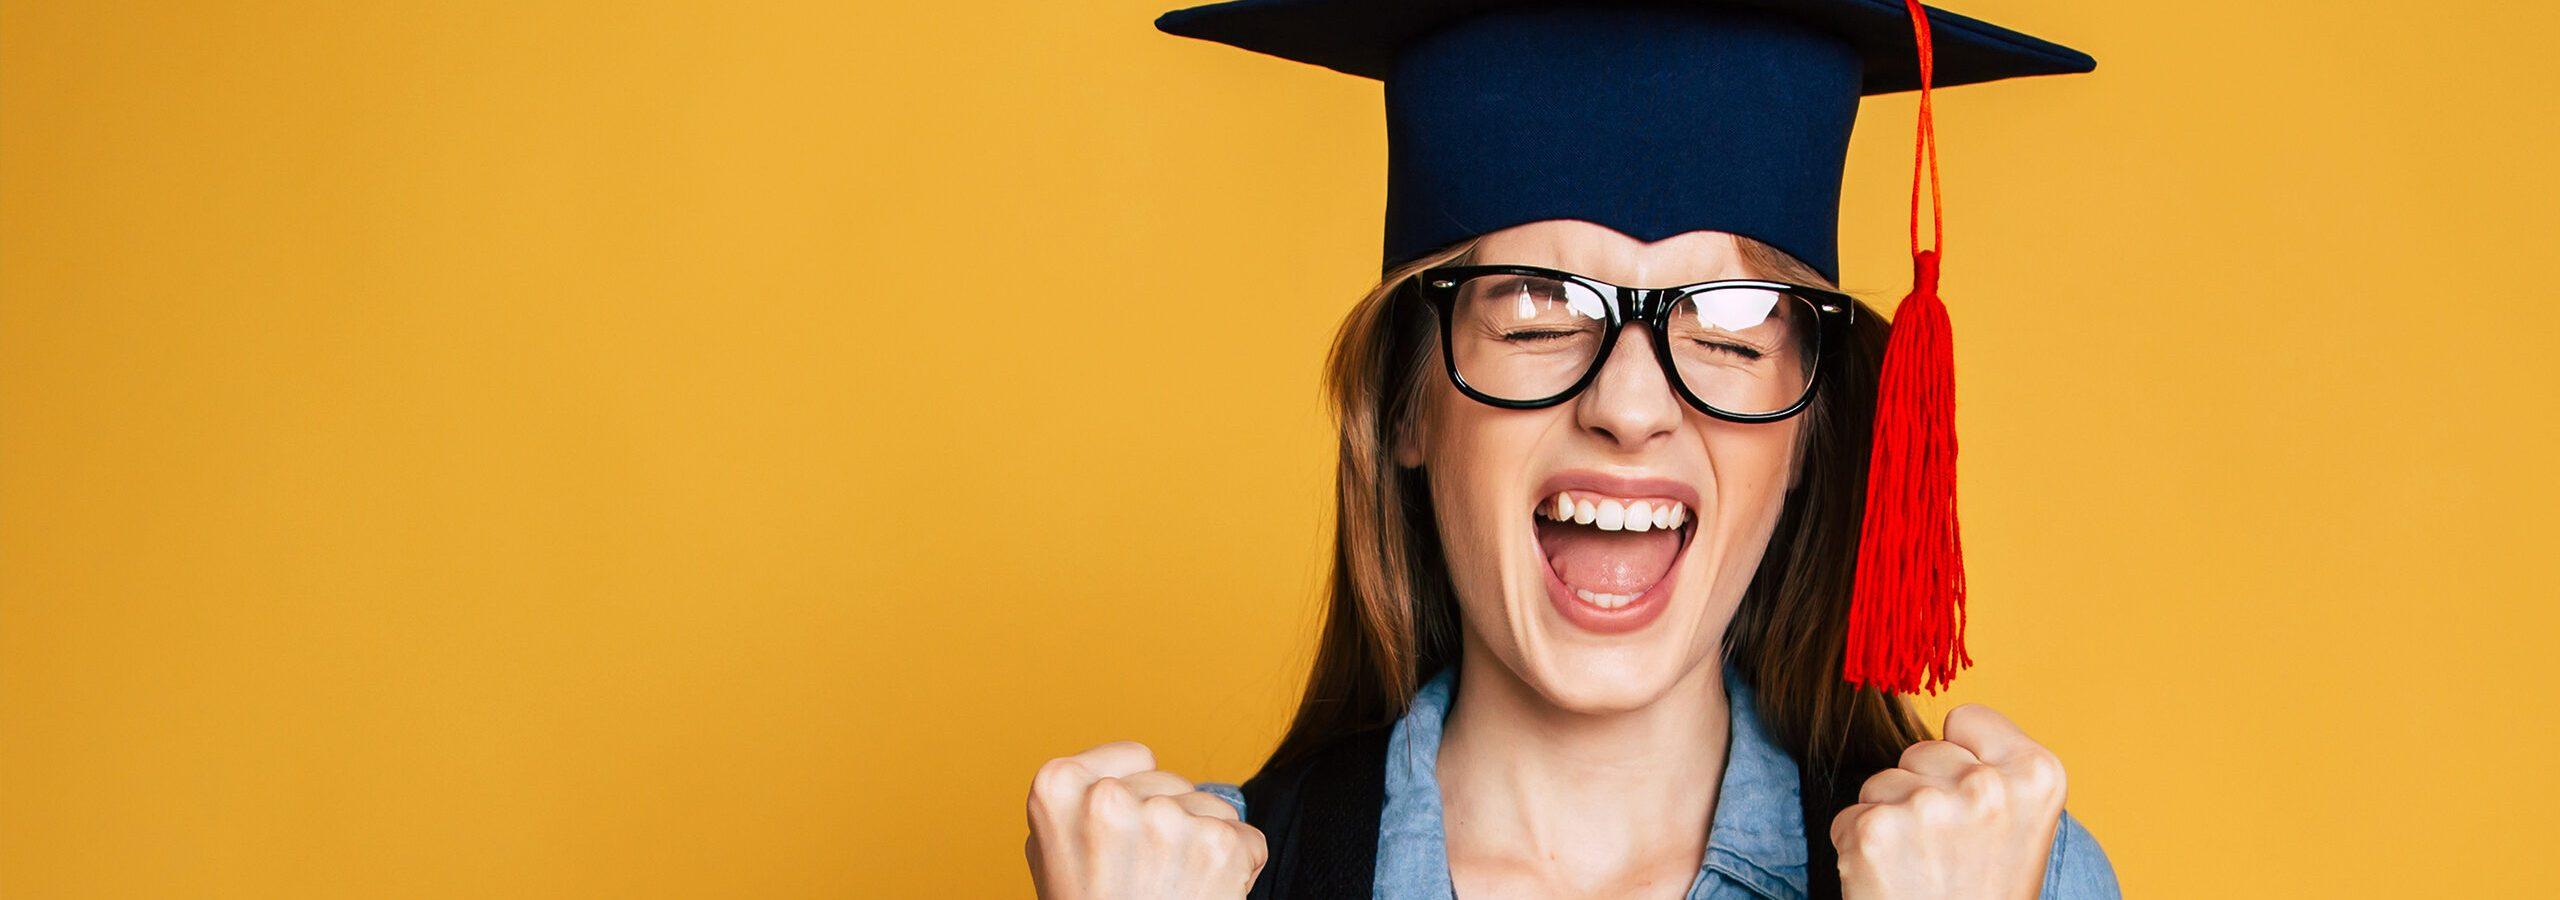 Woman celebrating graduation